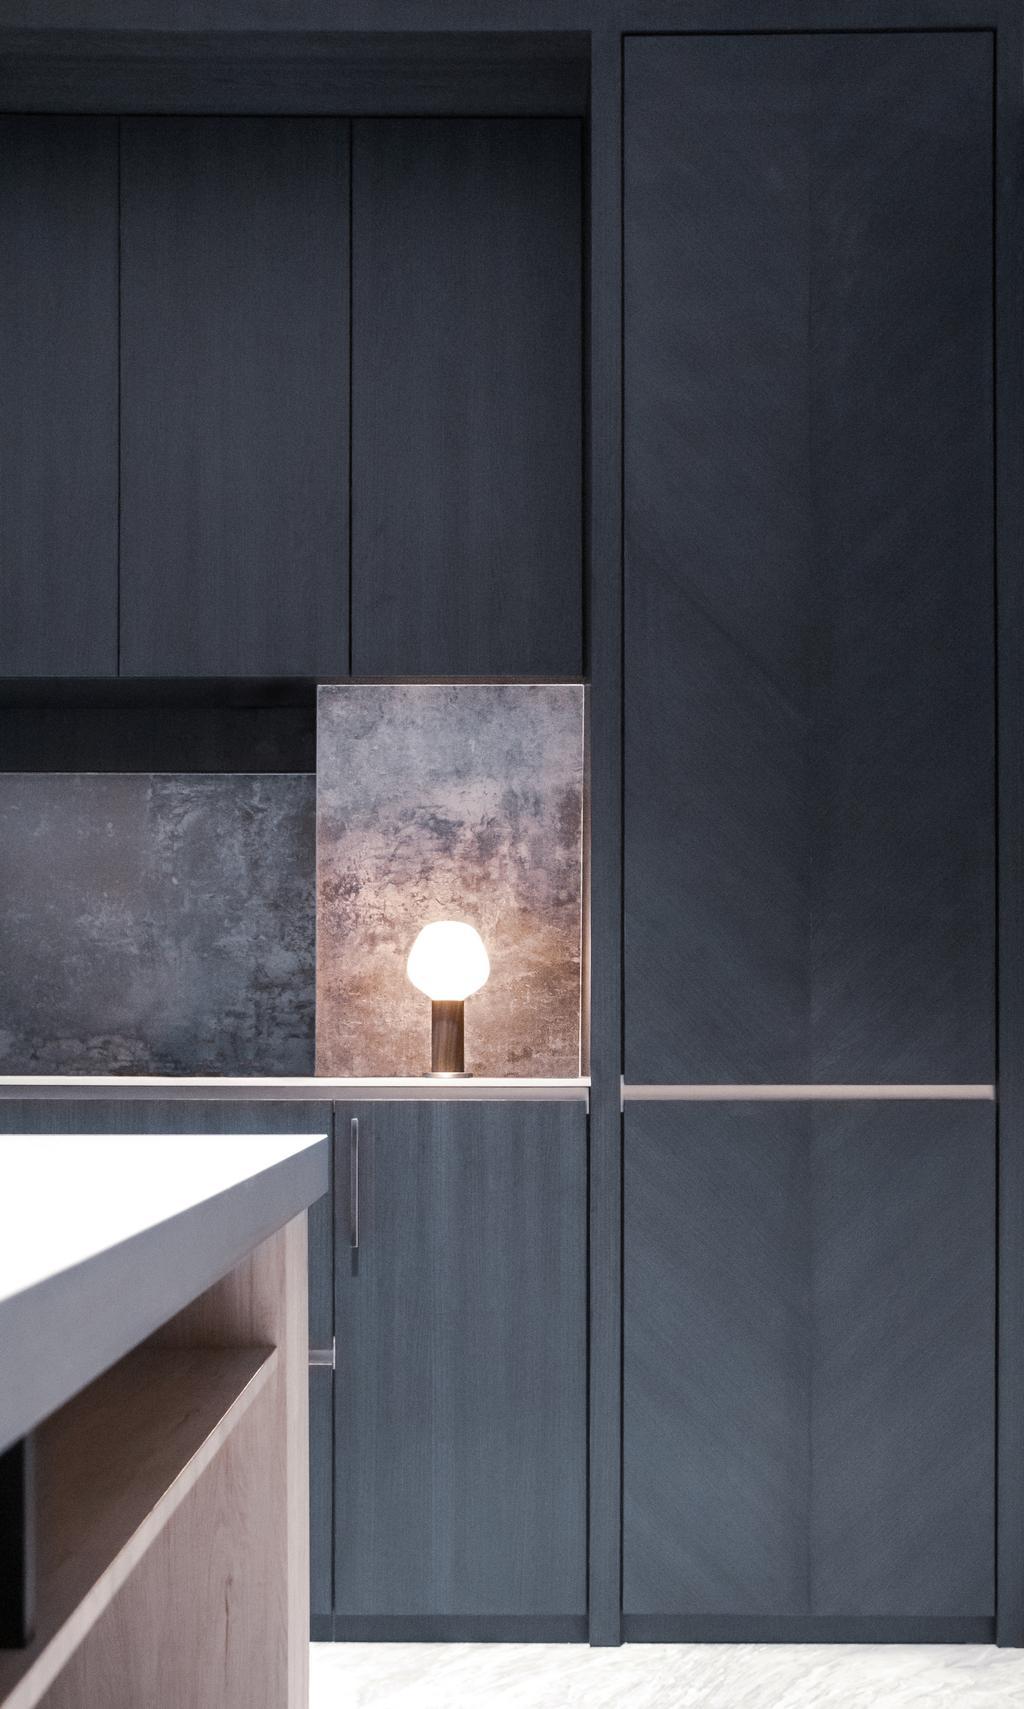 Defu Lane, Commercial, Interior Designer, KDOT, Contemporary, Industrial